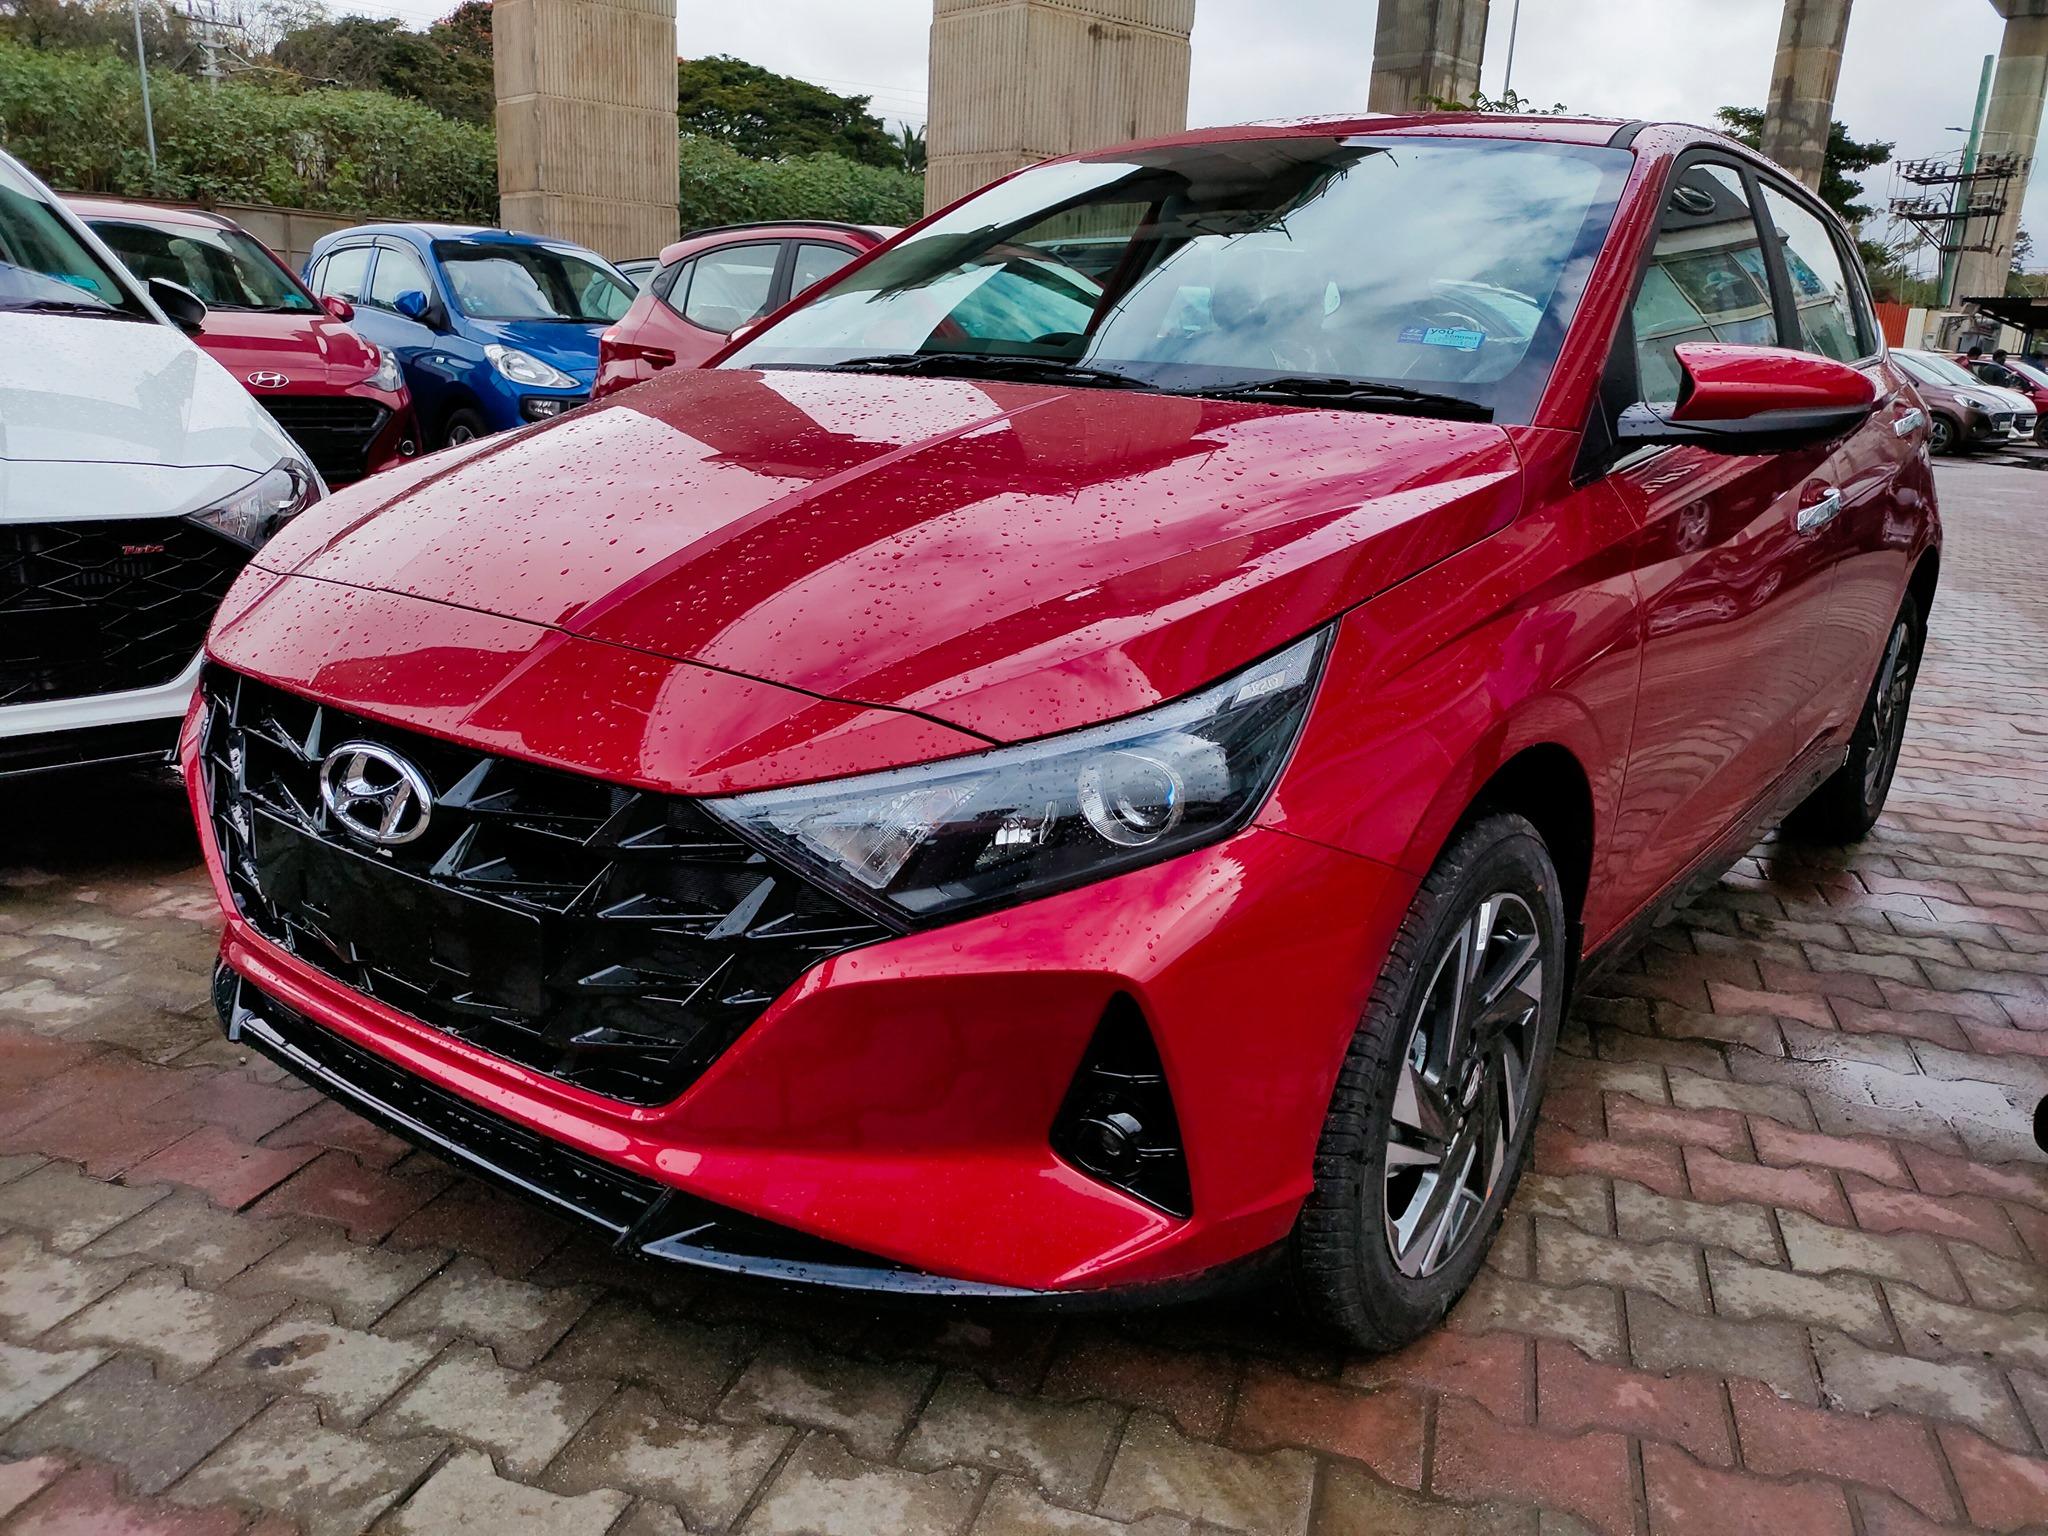 Hyundai i20 Hatchback Wins 2021 India Car of the Year Award 3